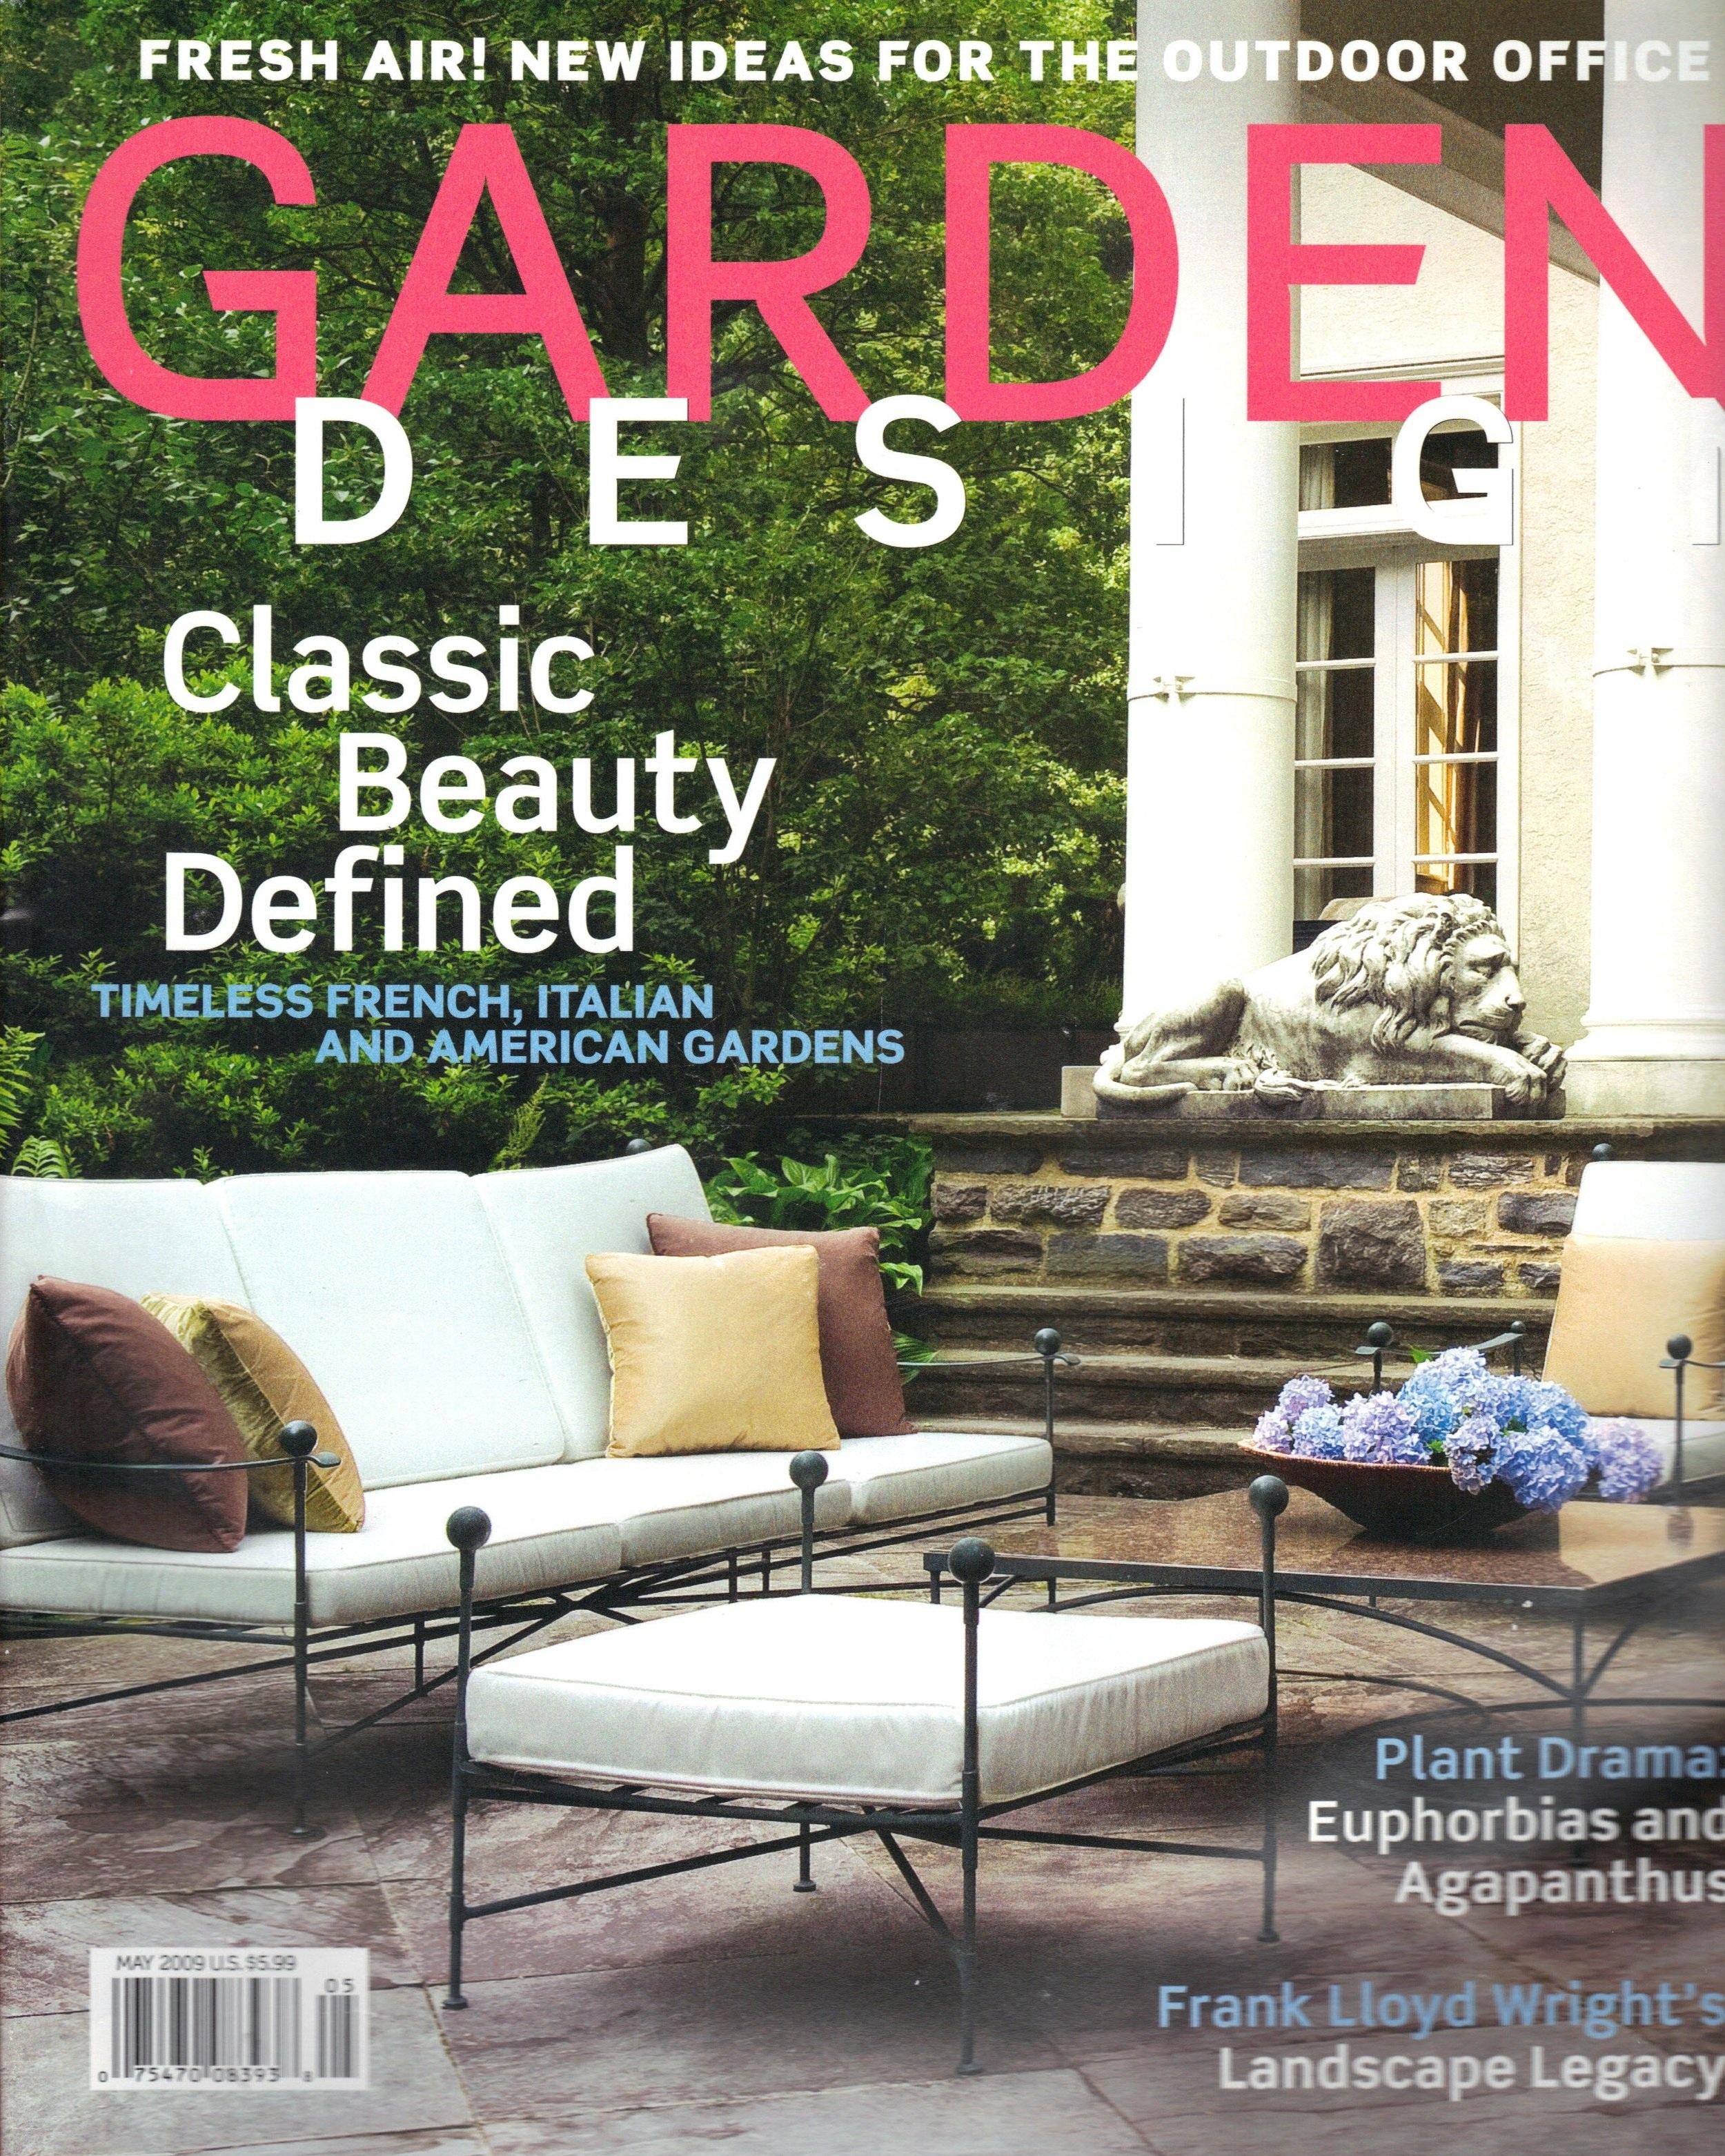 Garden_Design_5_09.jpg